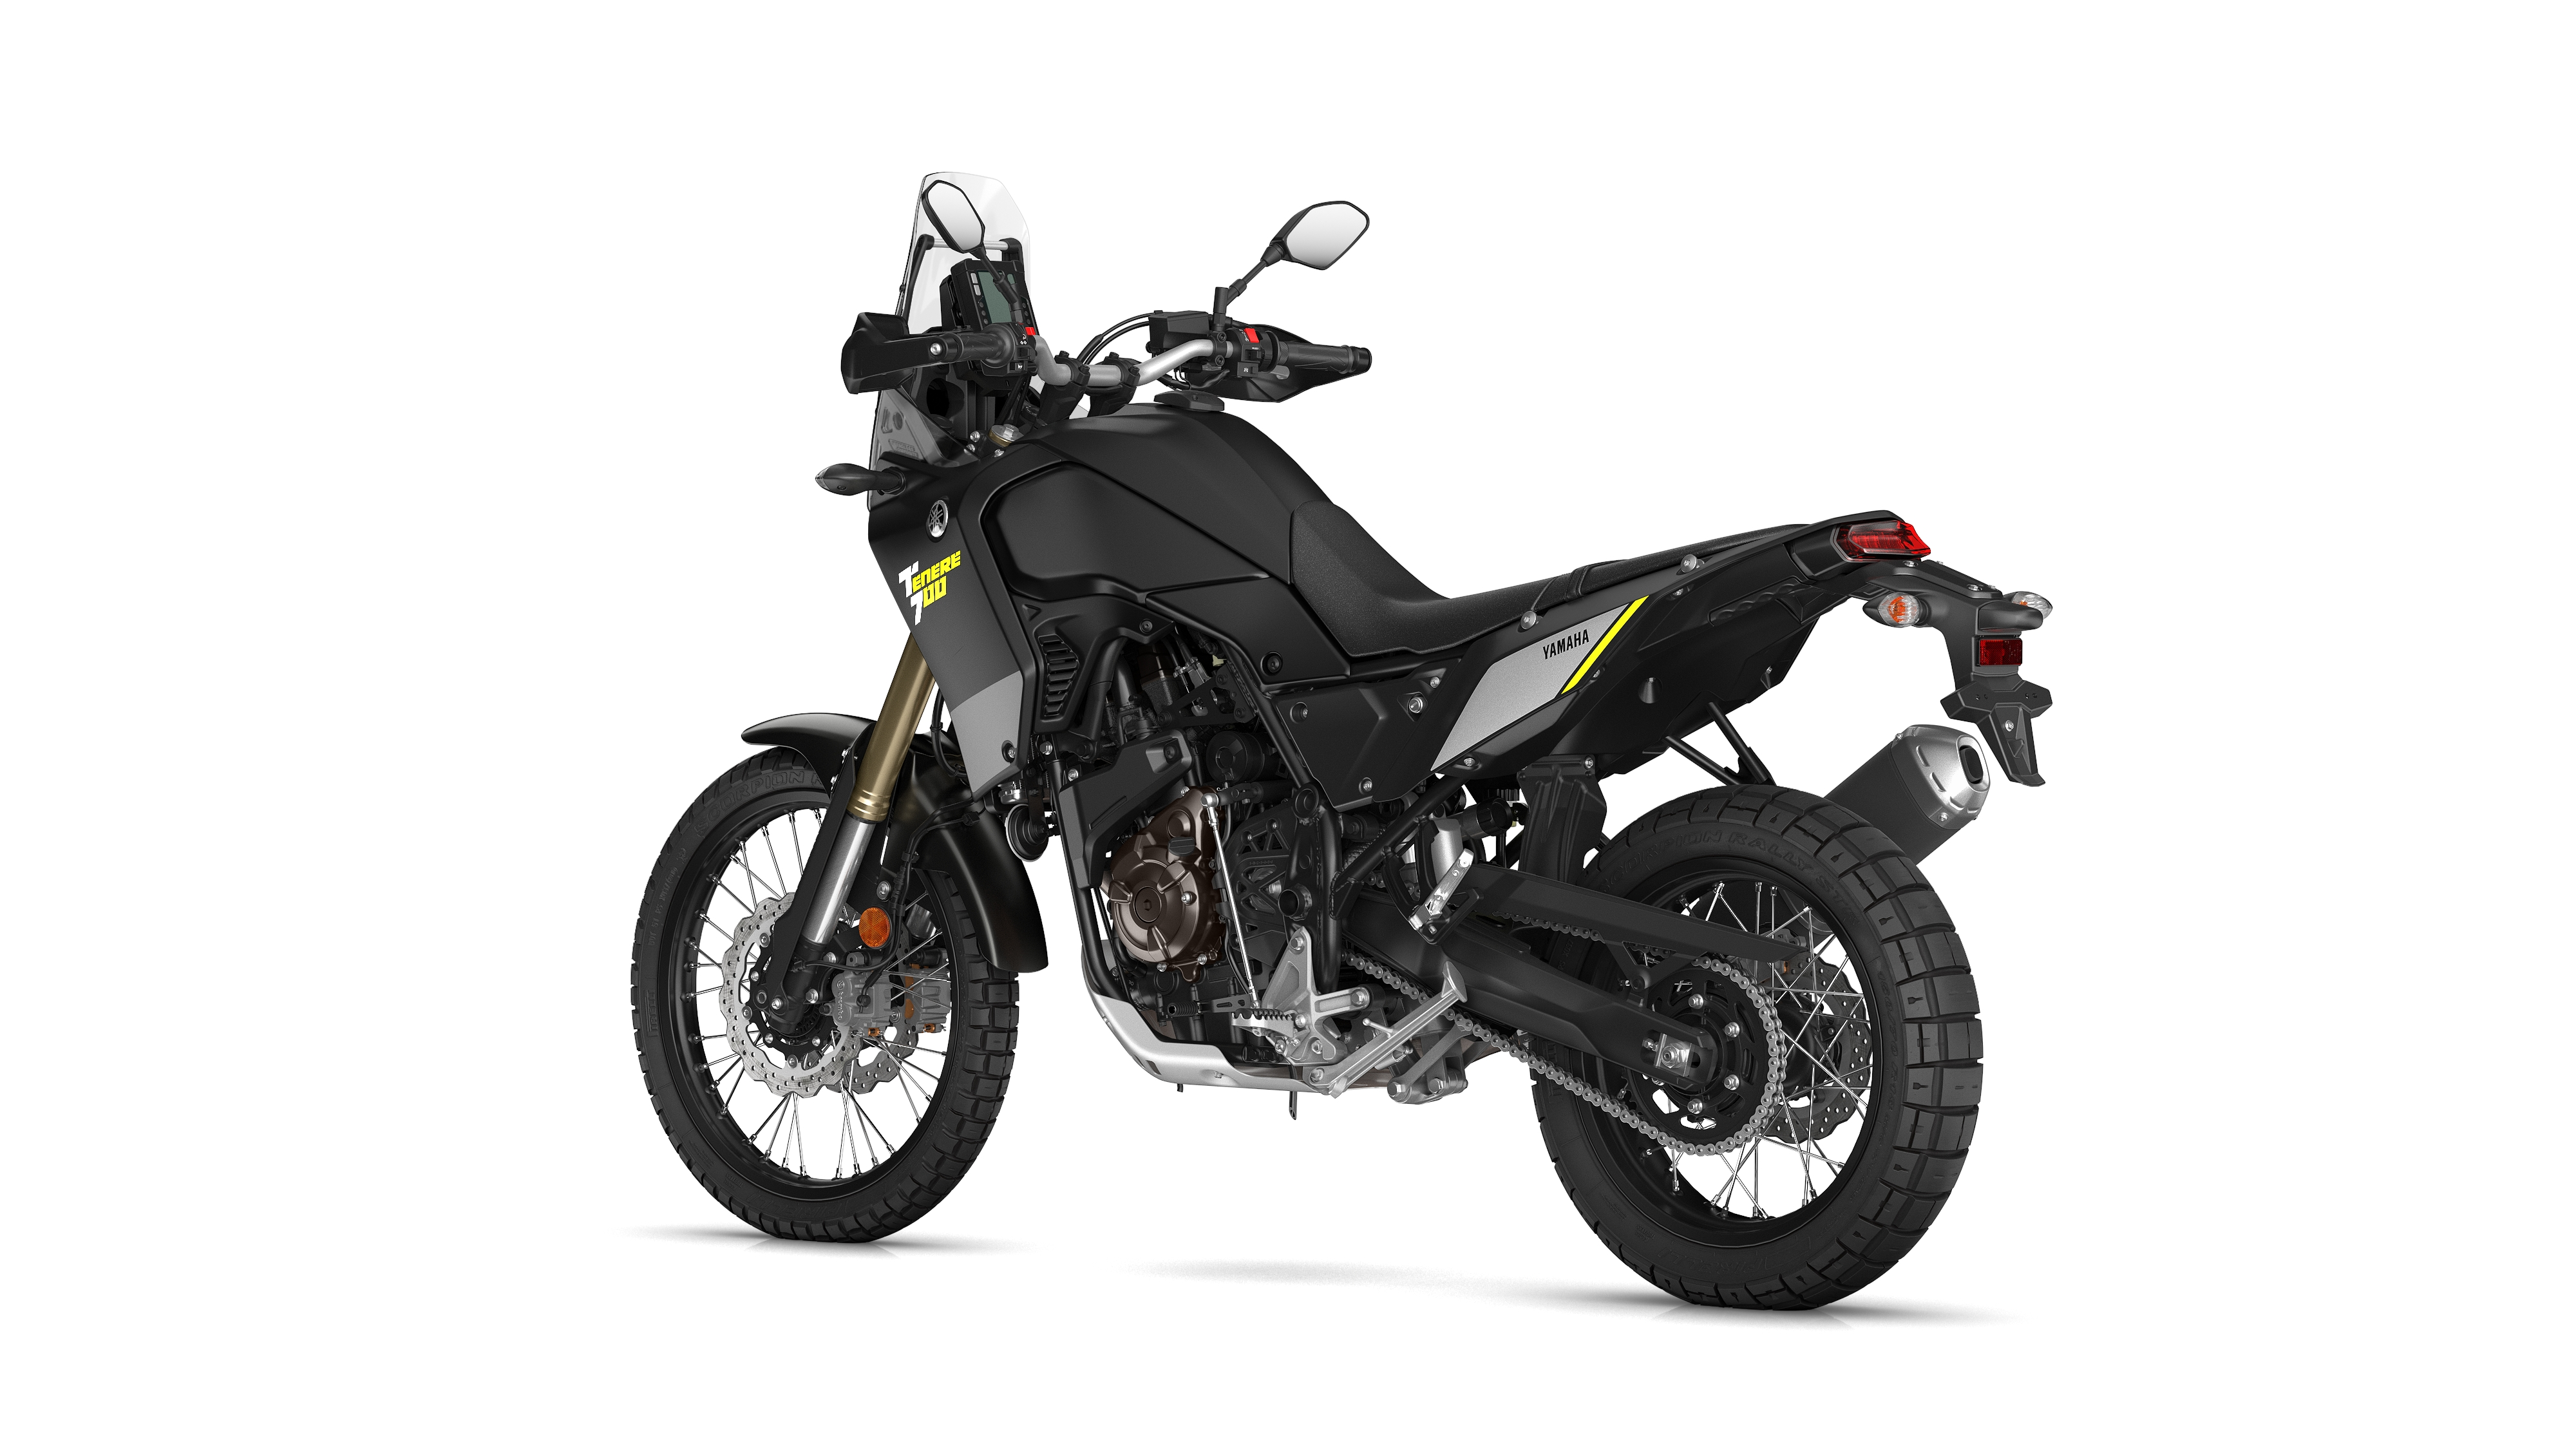 Yamaha Tenere T7 | MotorCentrumWest